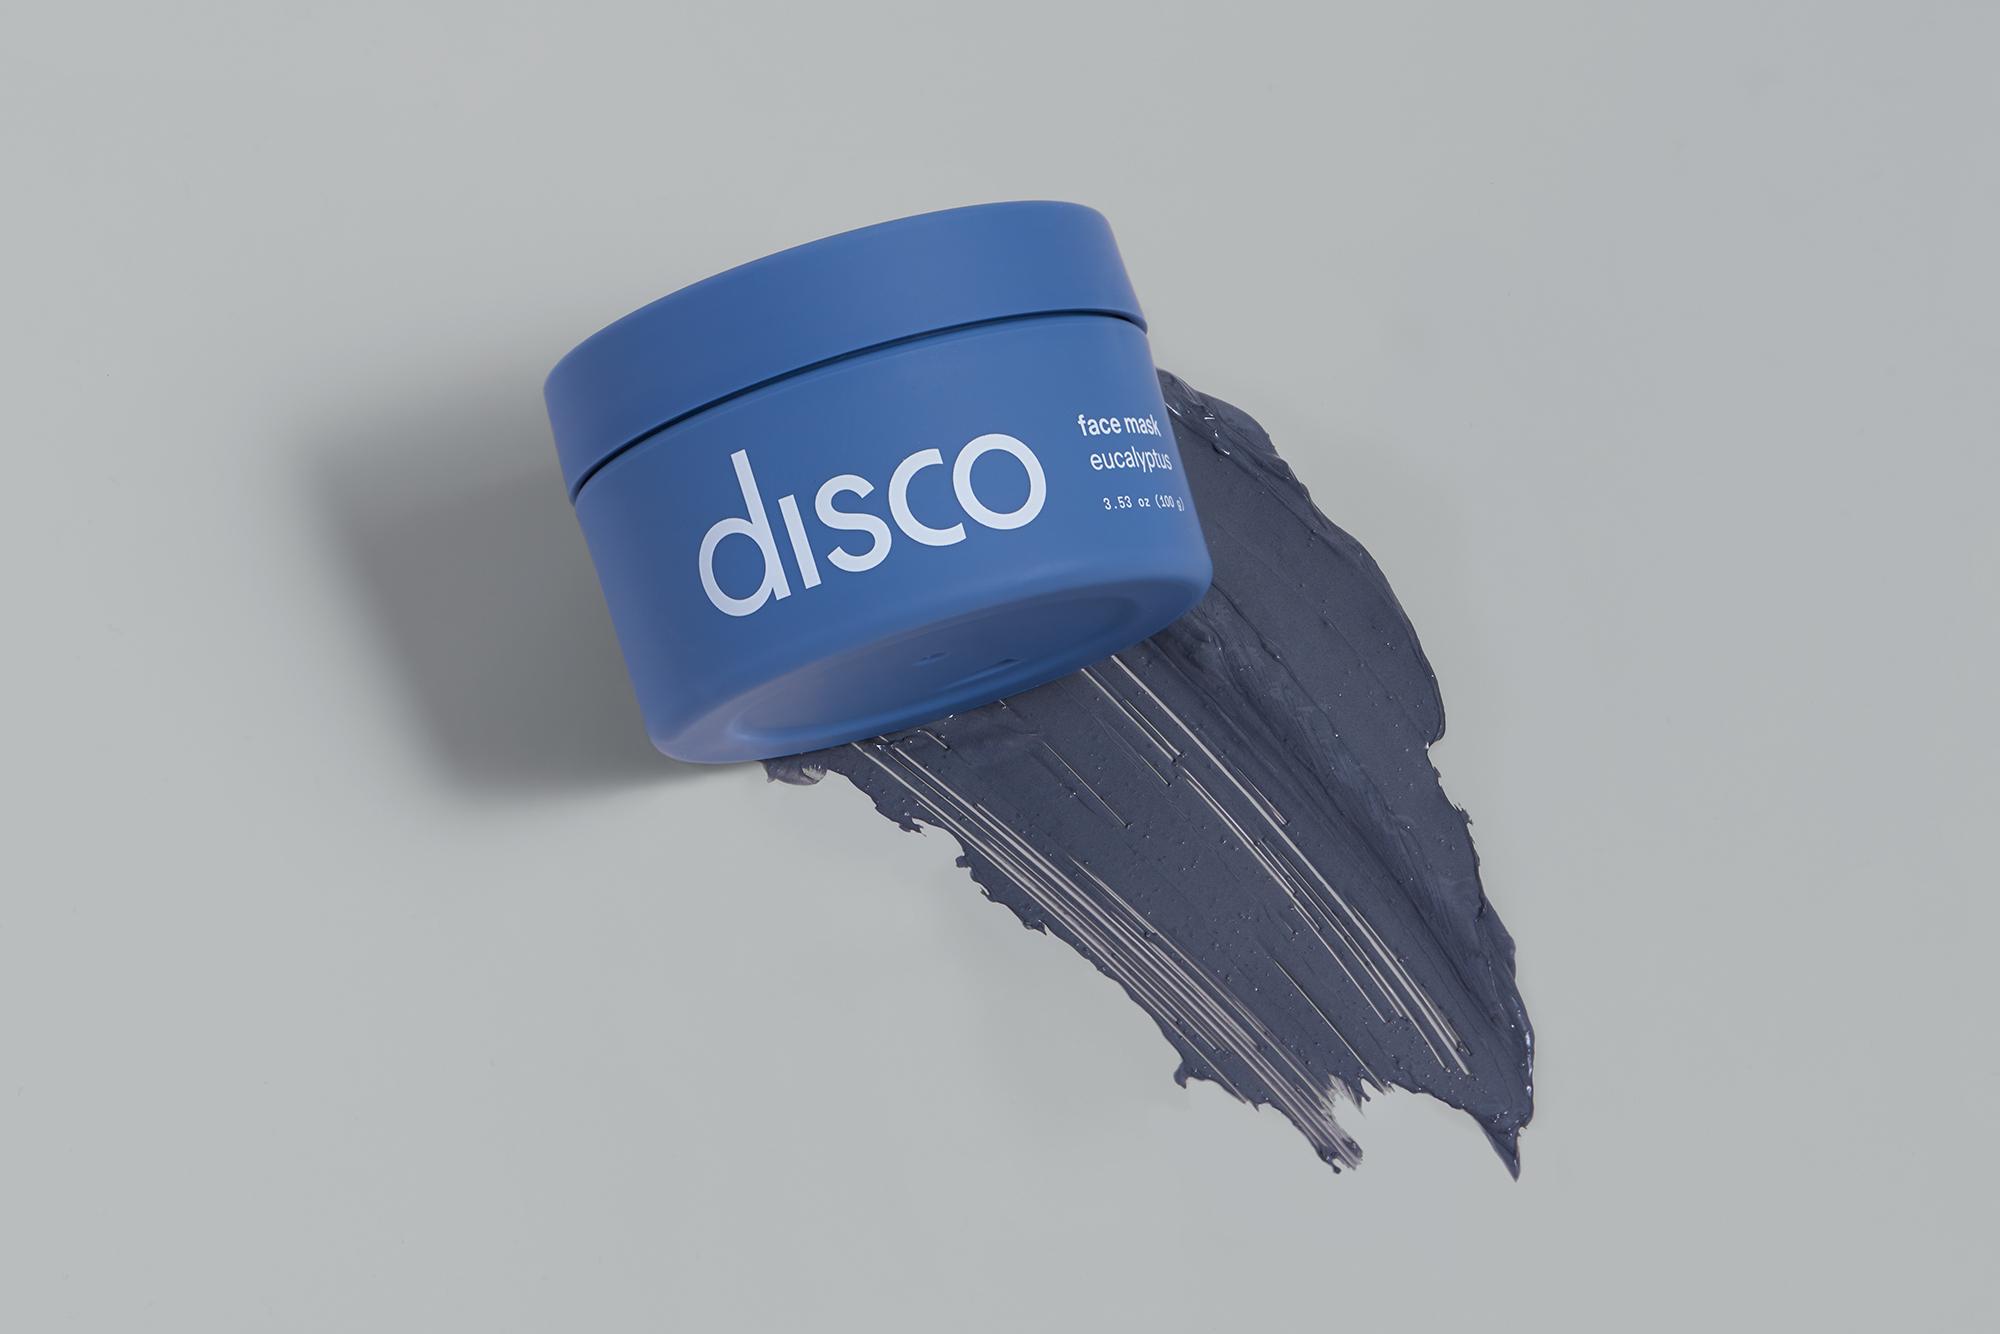 Disco-product12218